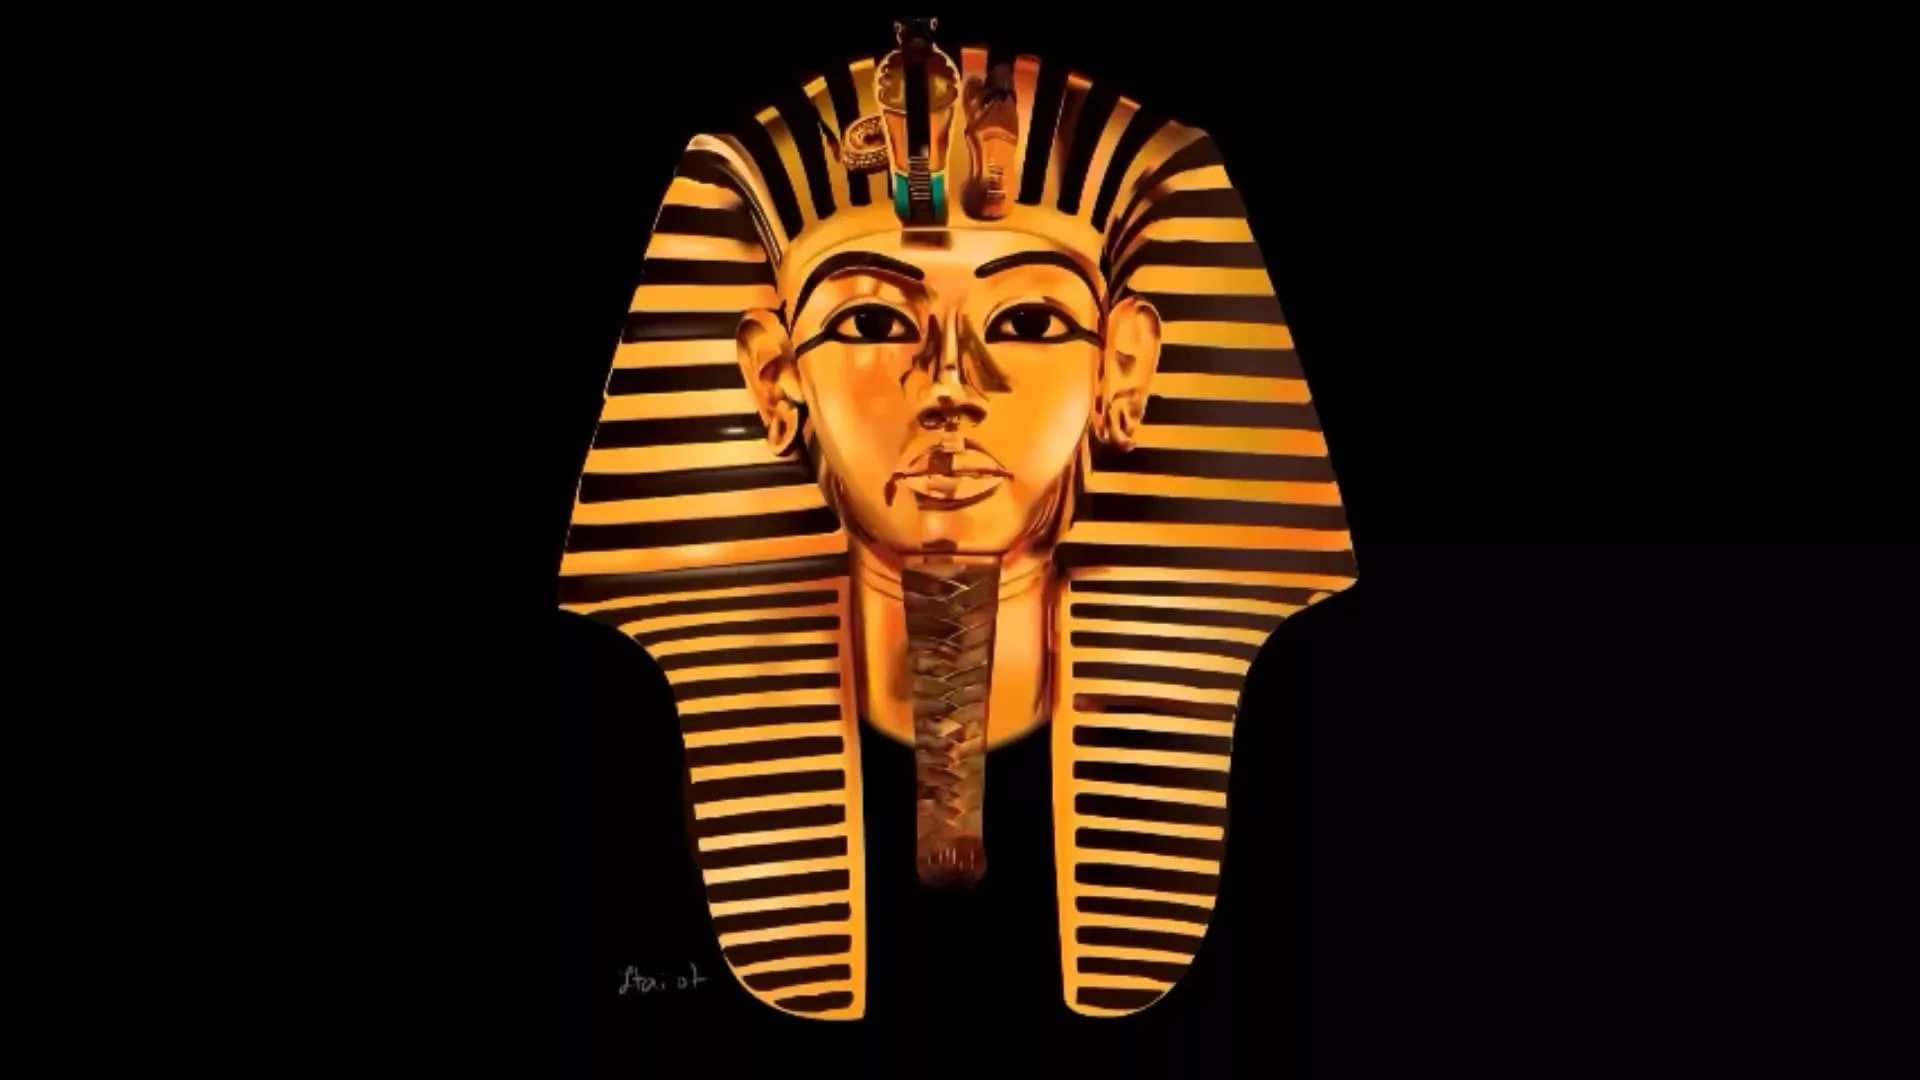 Cool Egyptian Wallpaper